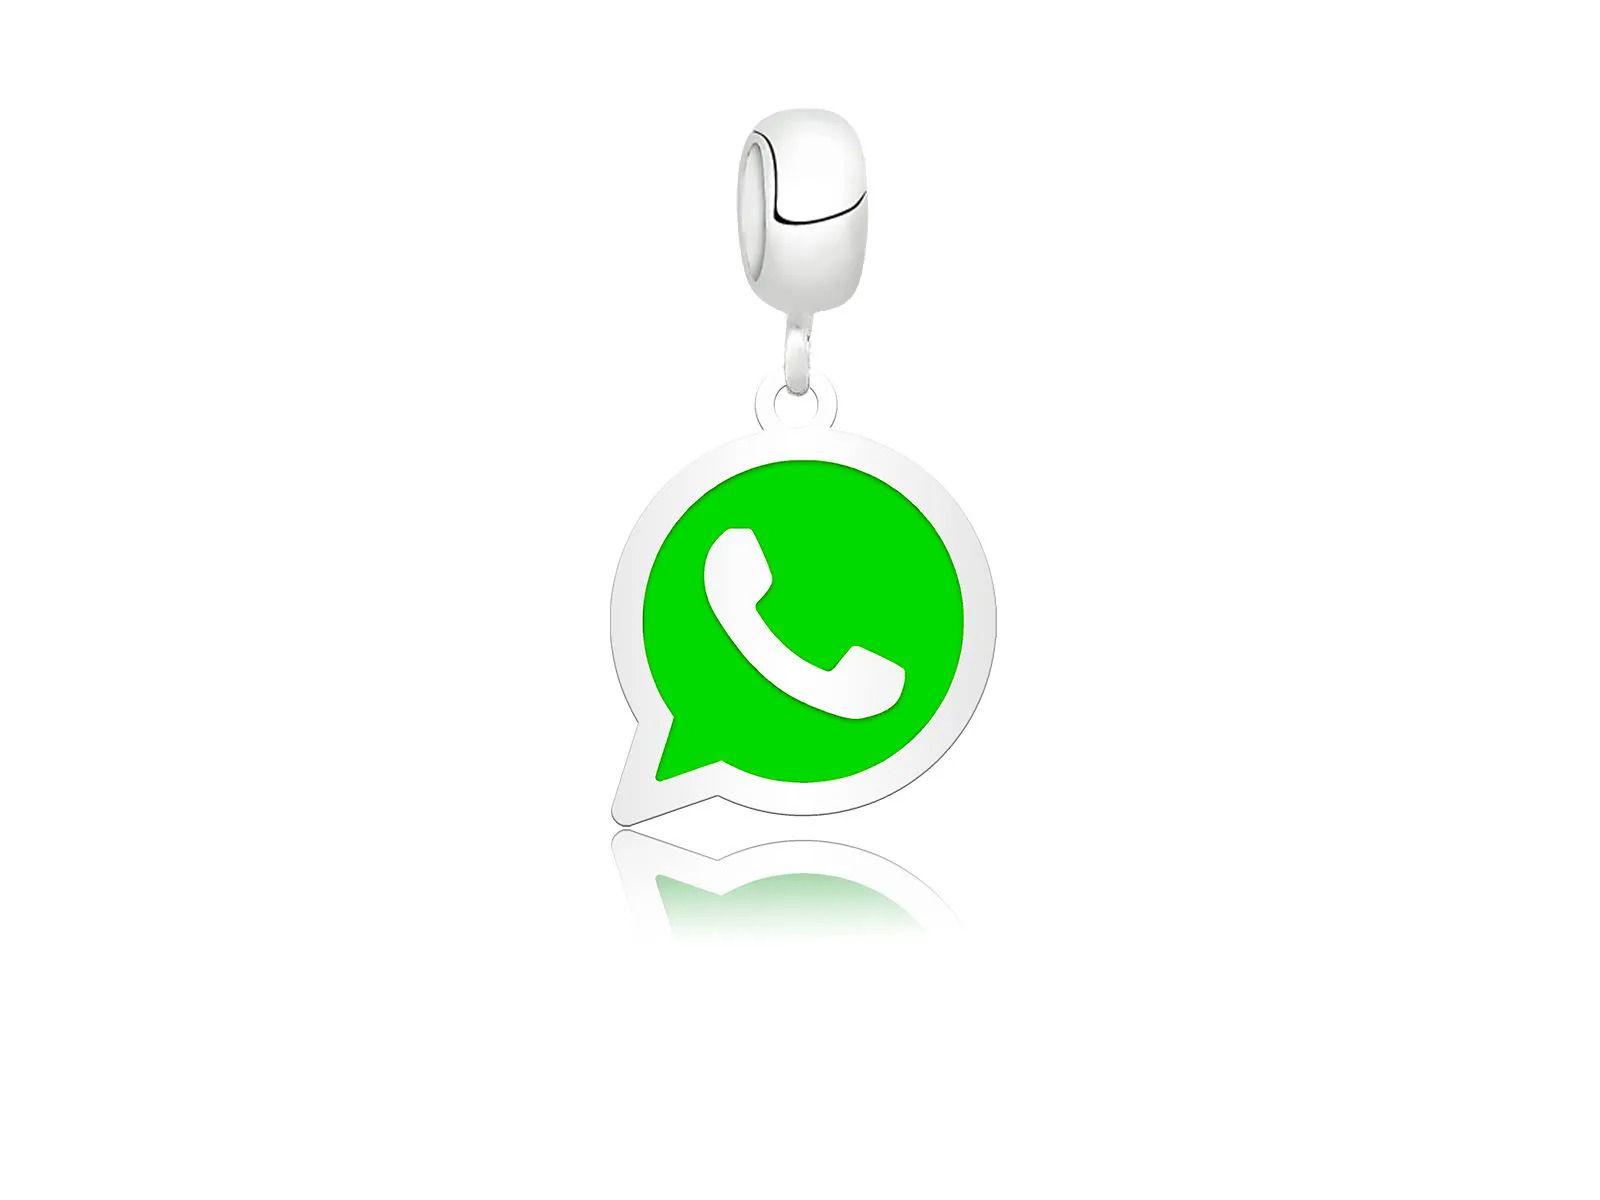 Berloque Simbolo Do Whatsapp Claro